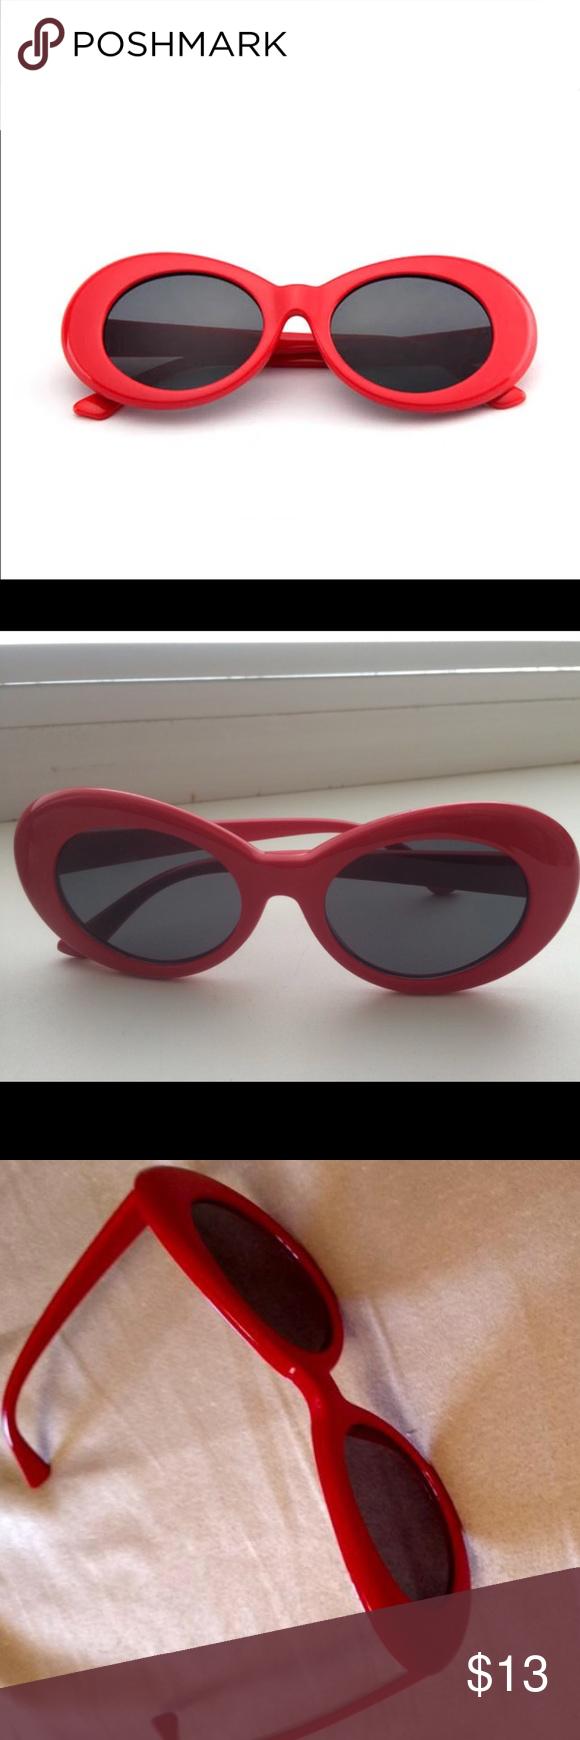 Red Fashion Glasses Glasses Fashion Red Sunglasses Red Fashion